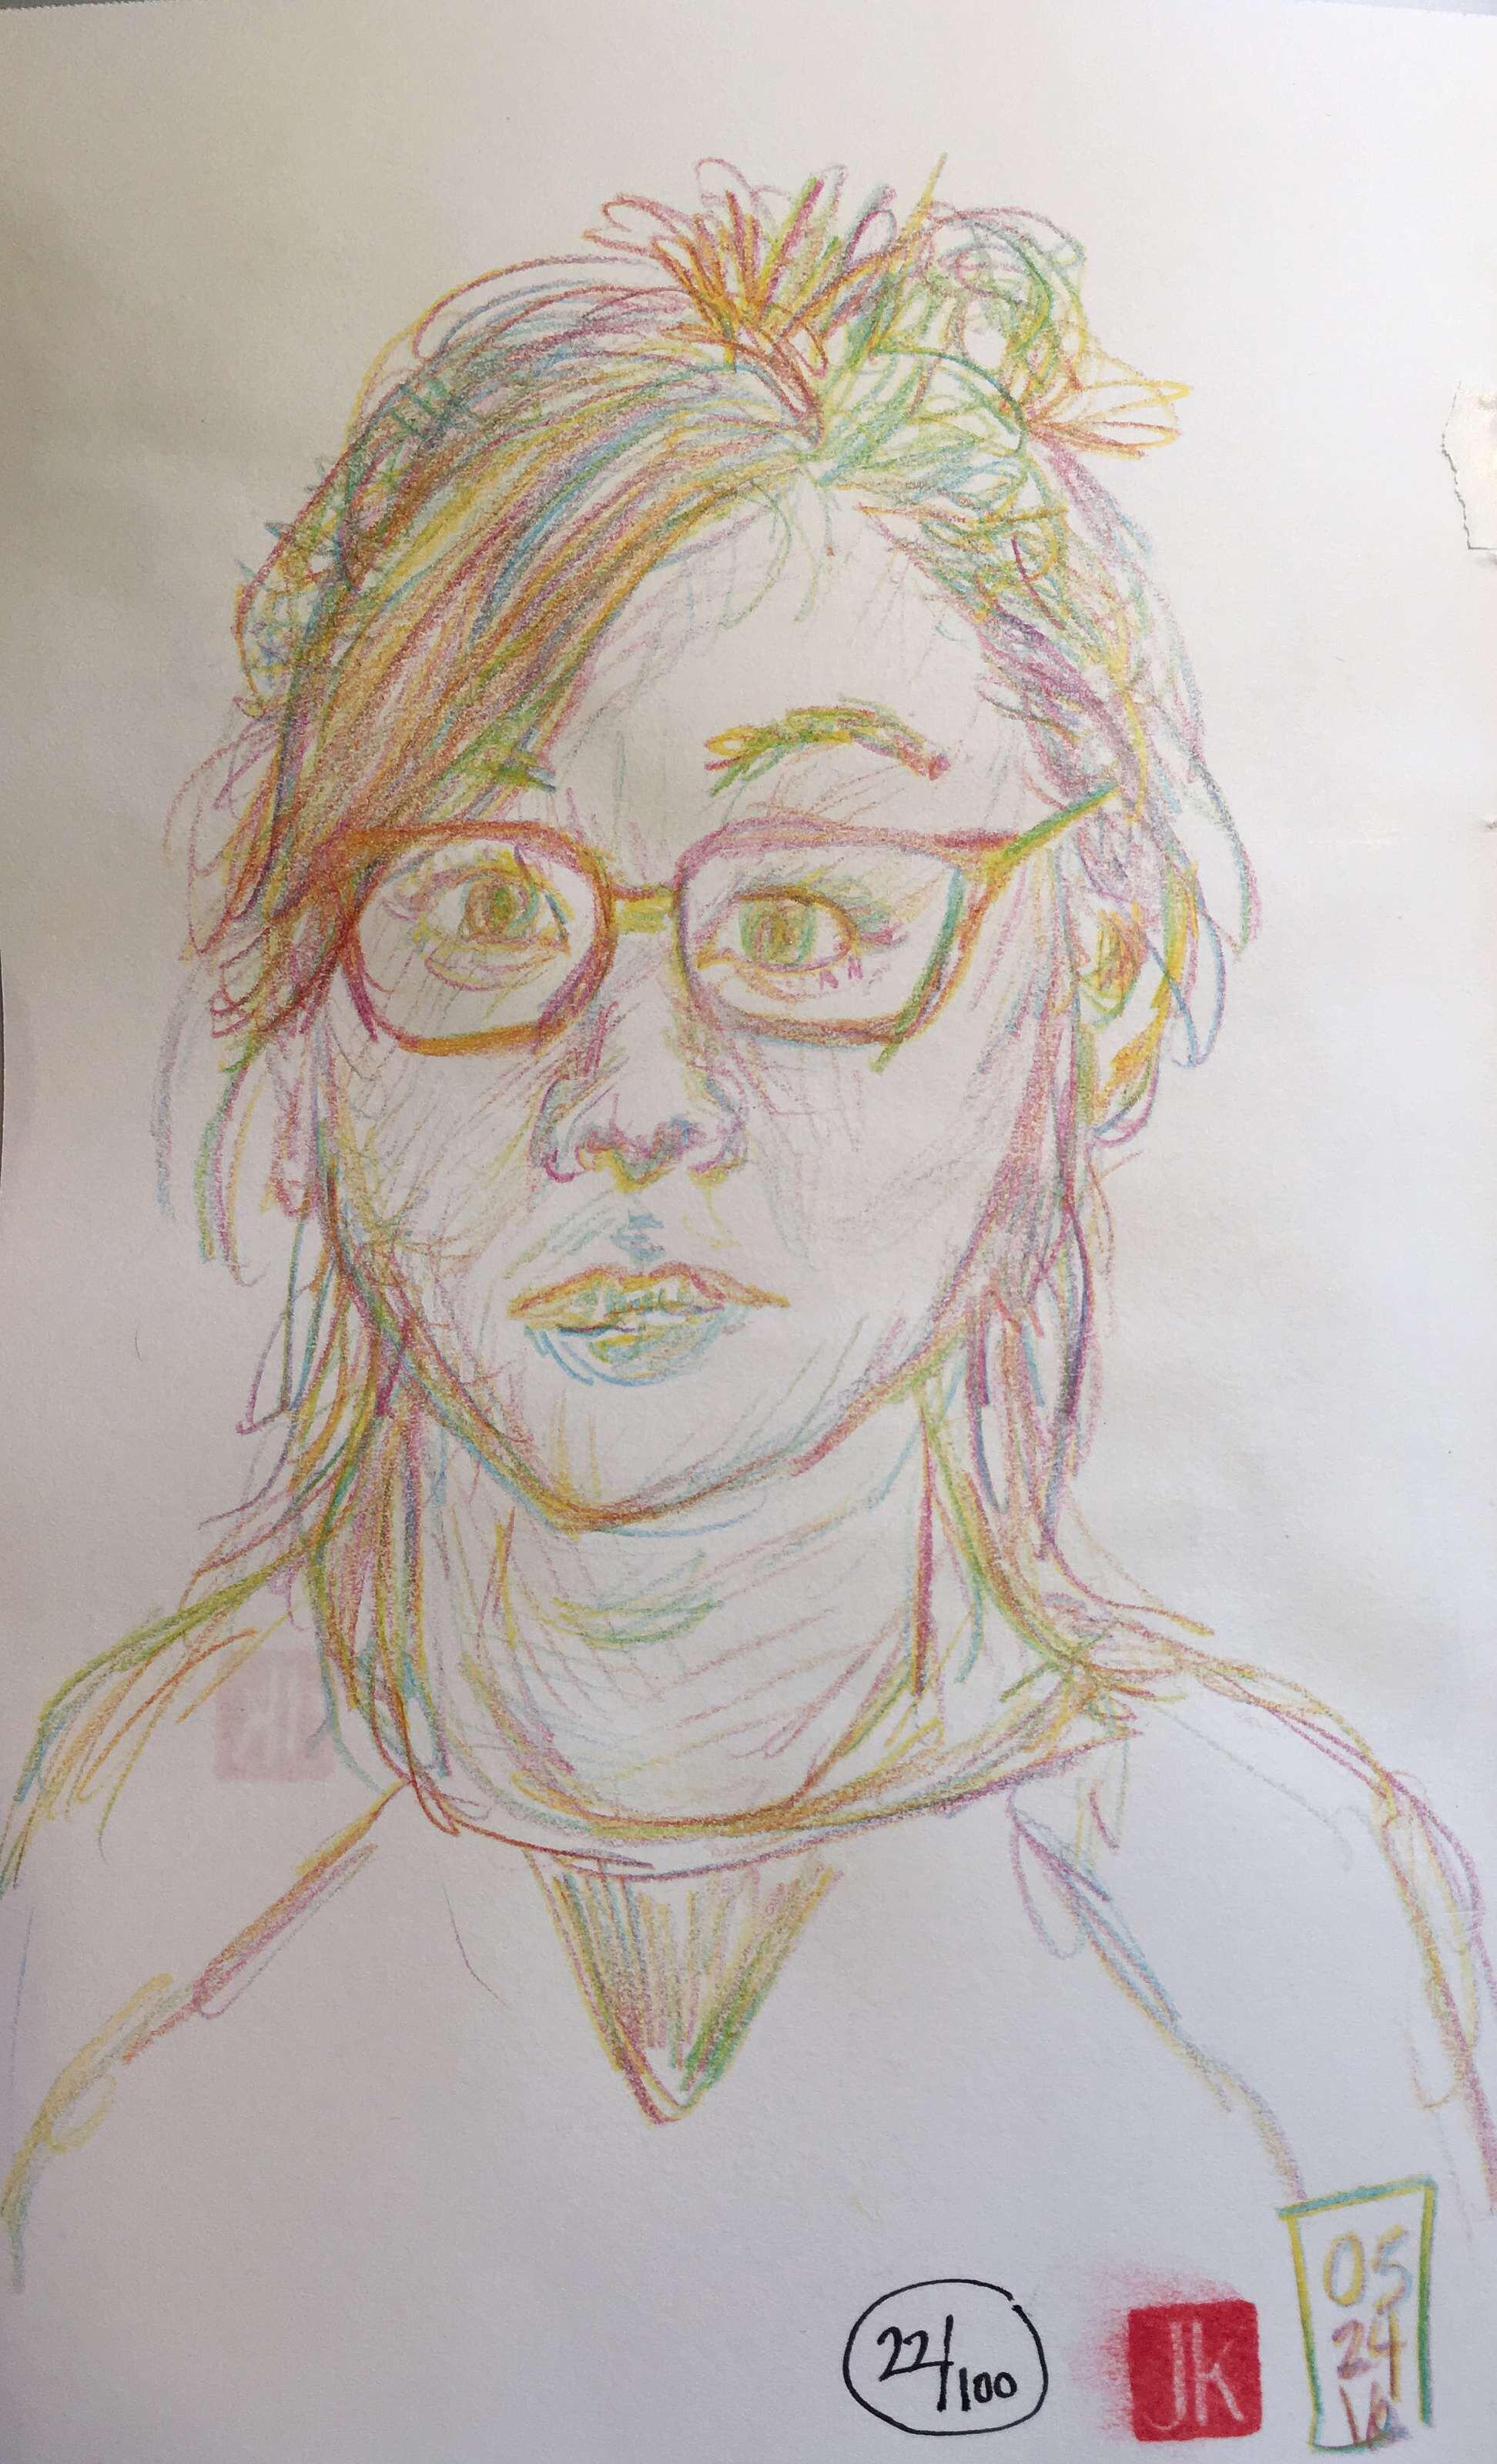 22/100 - Self-Portrait